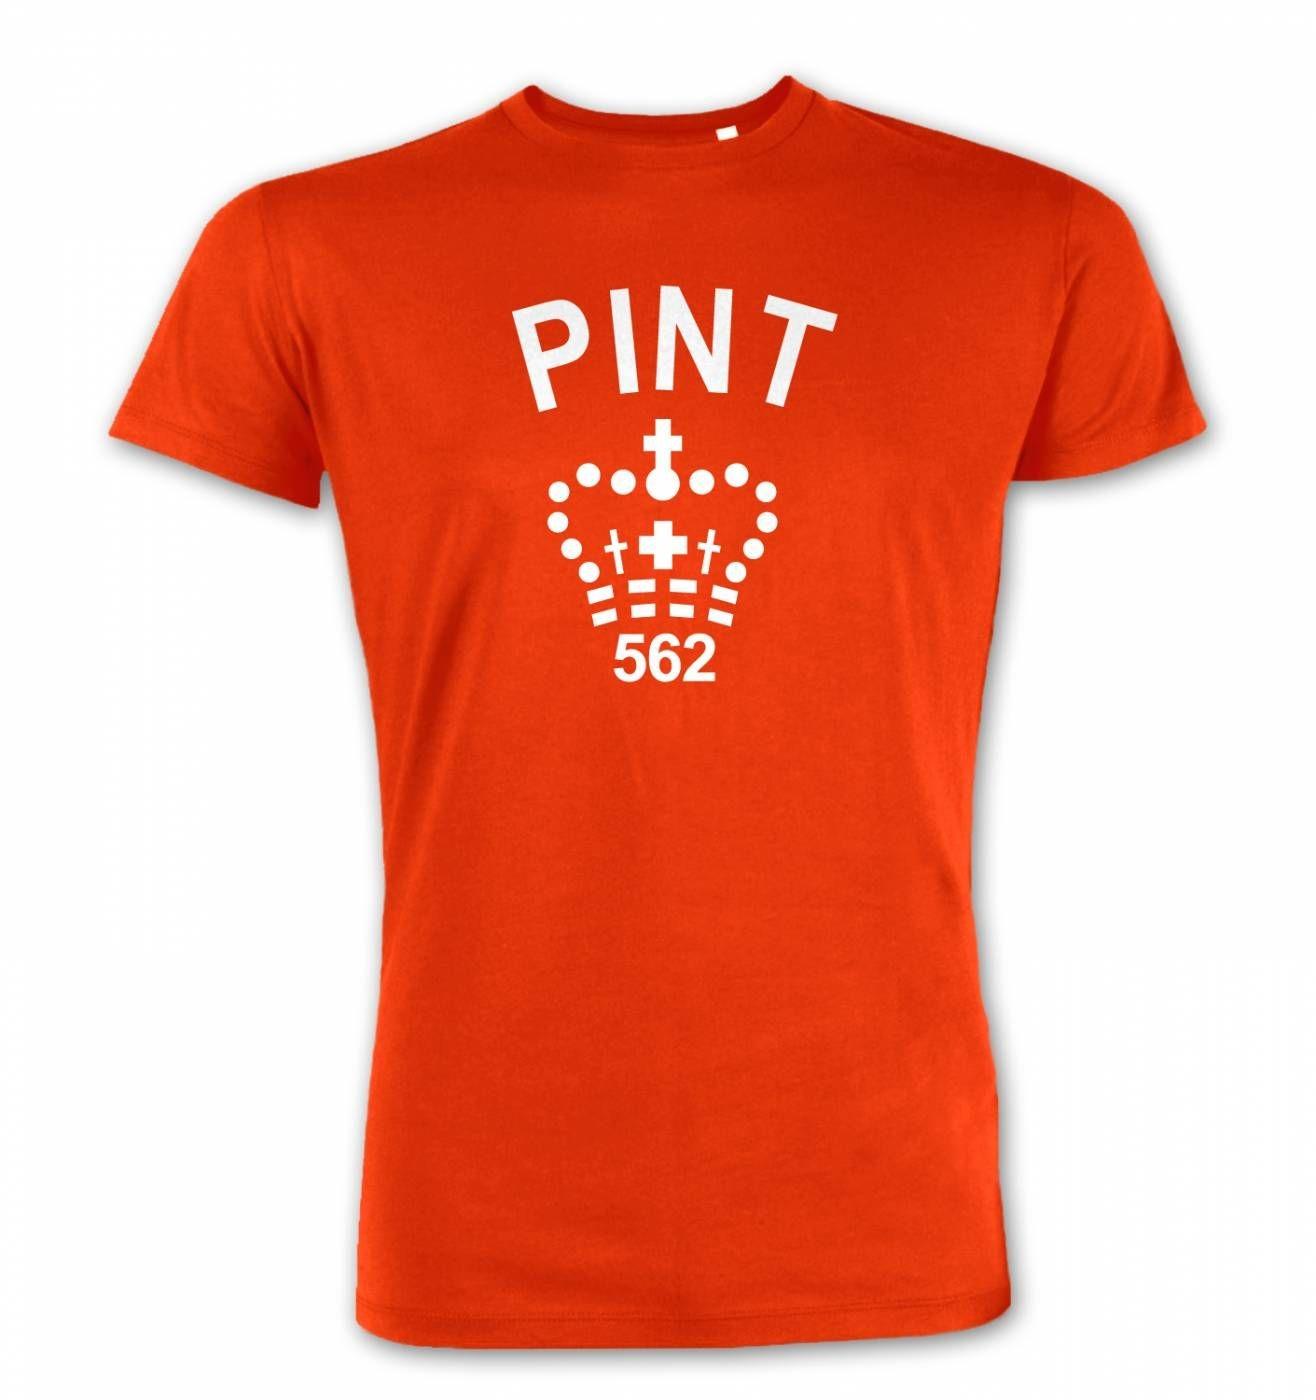 Men's Pint Tshirt